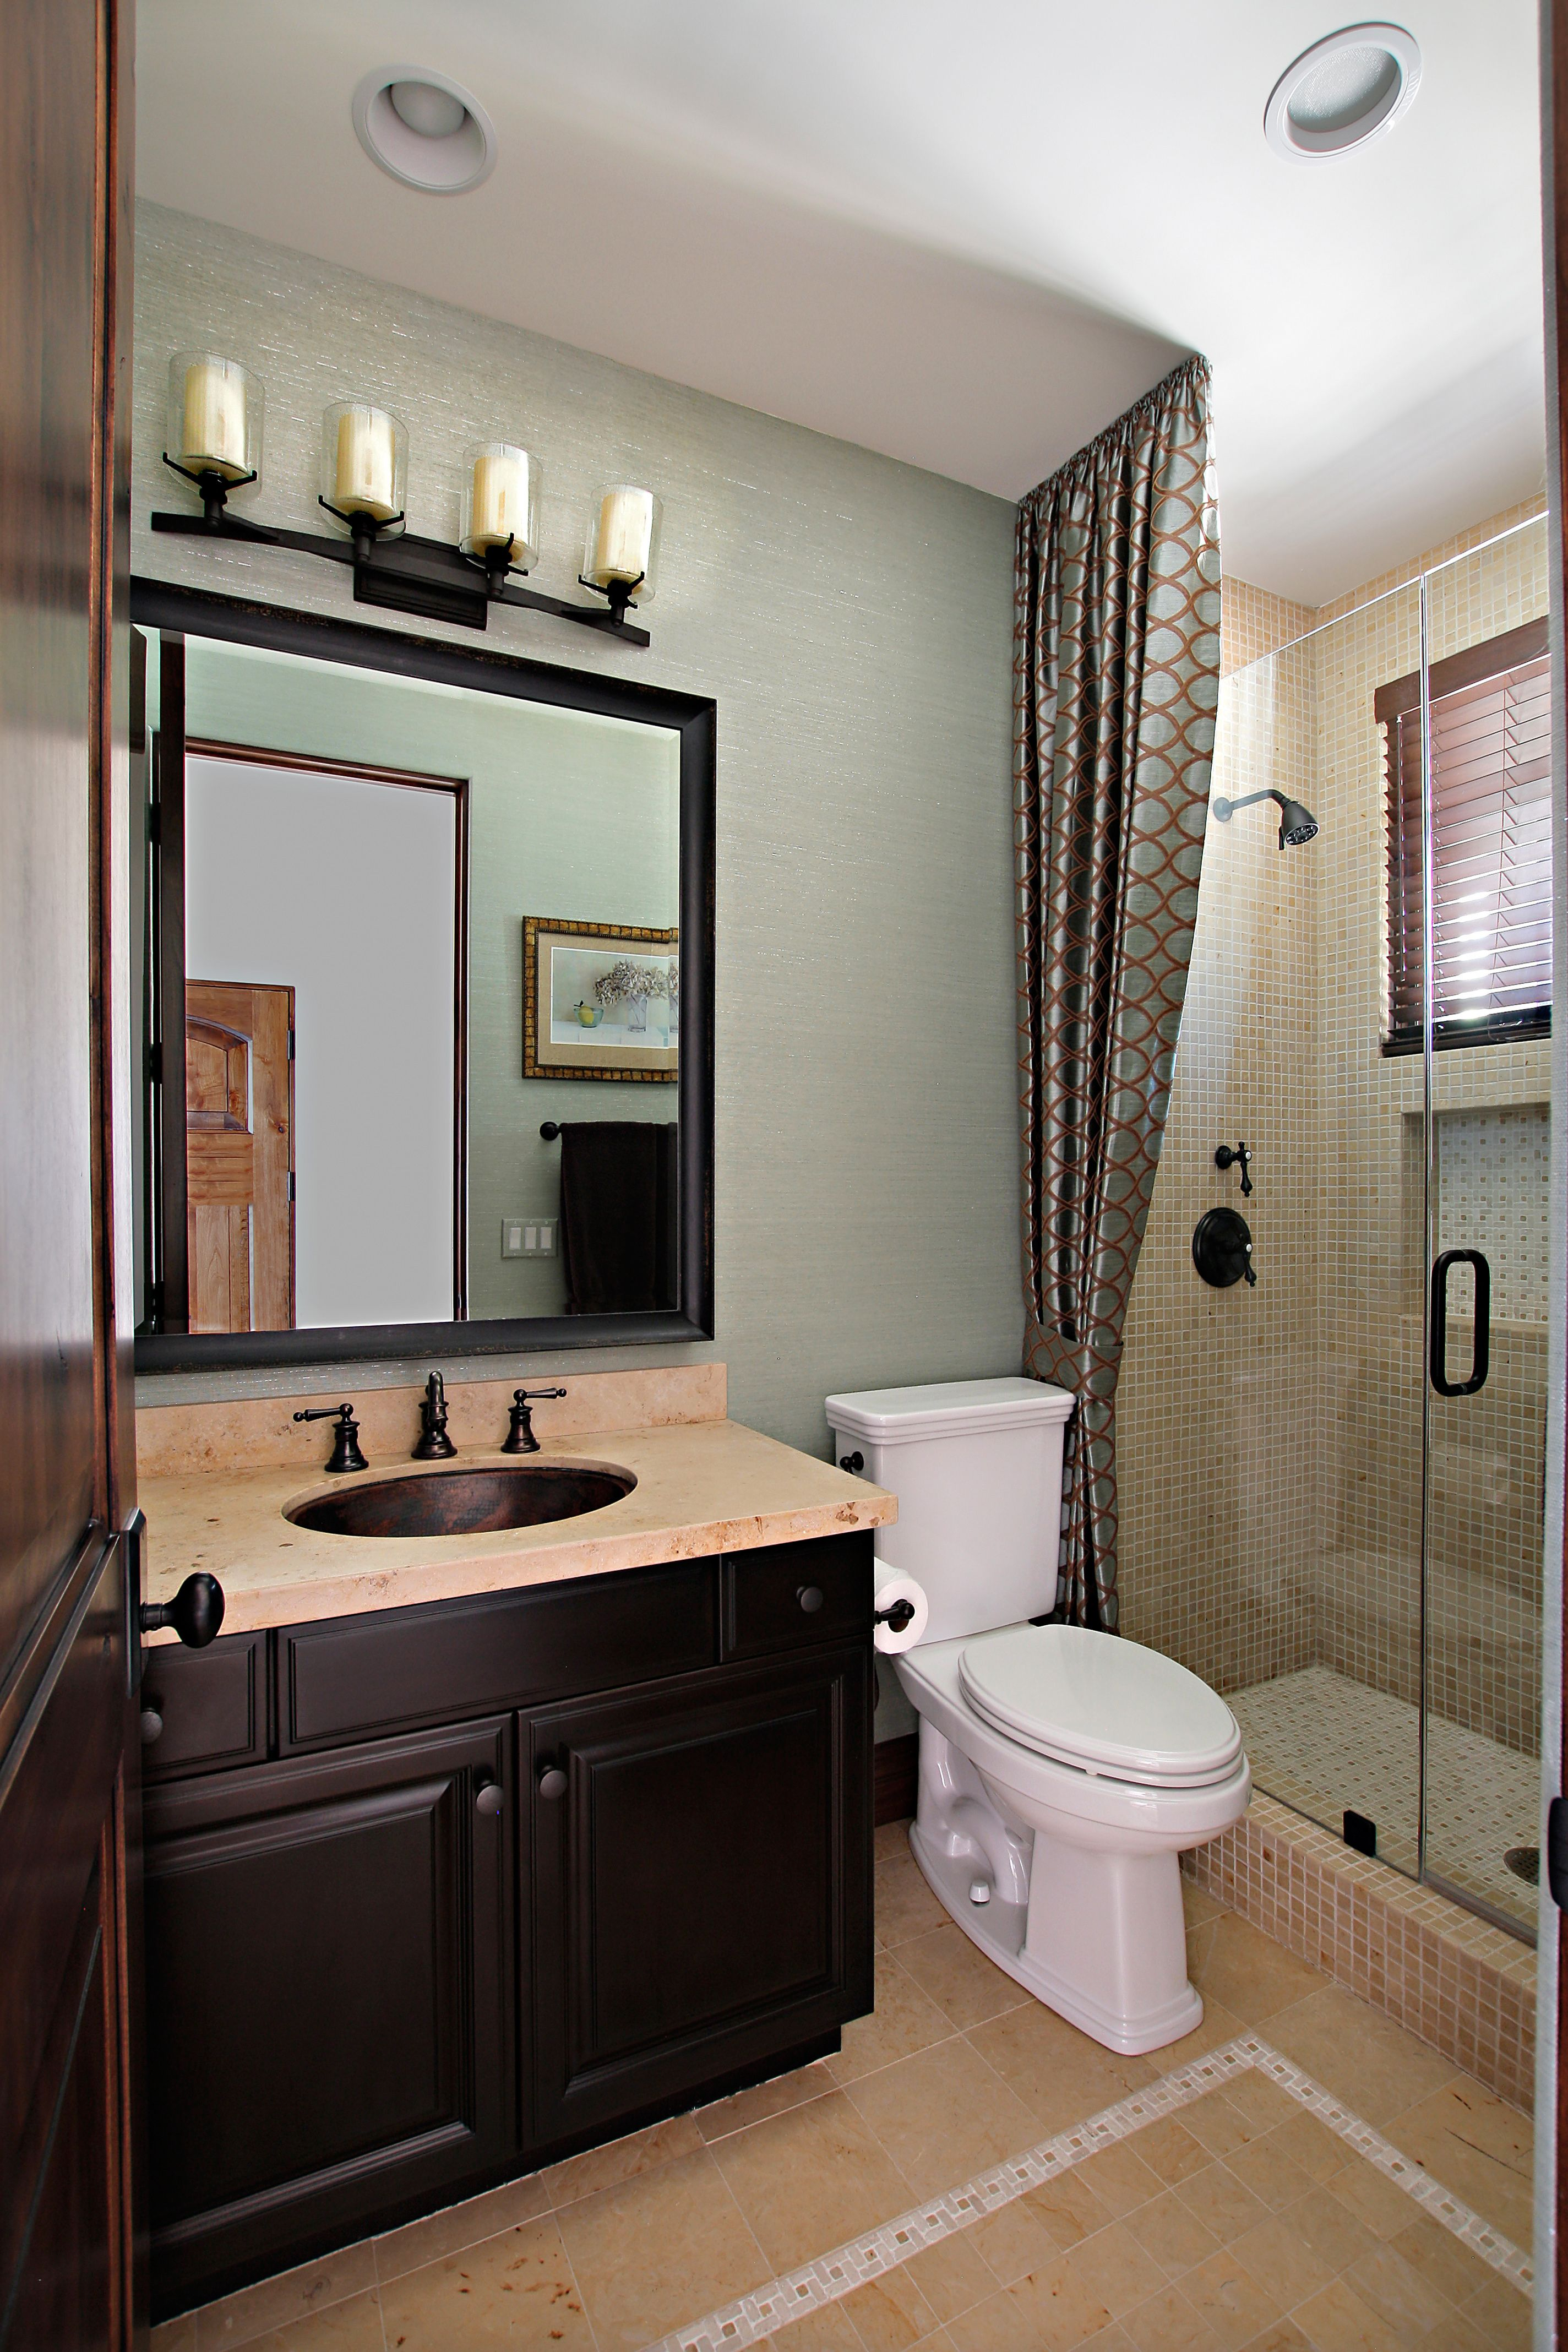 Small Apartment Bathroom Decor Internal Home Design In 2020 Guest Bathroom Small Bathroom Design Small Guest Bathrooms